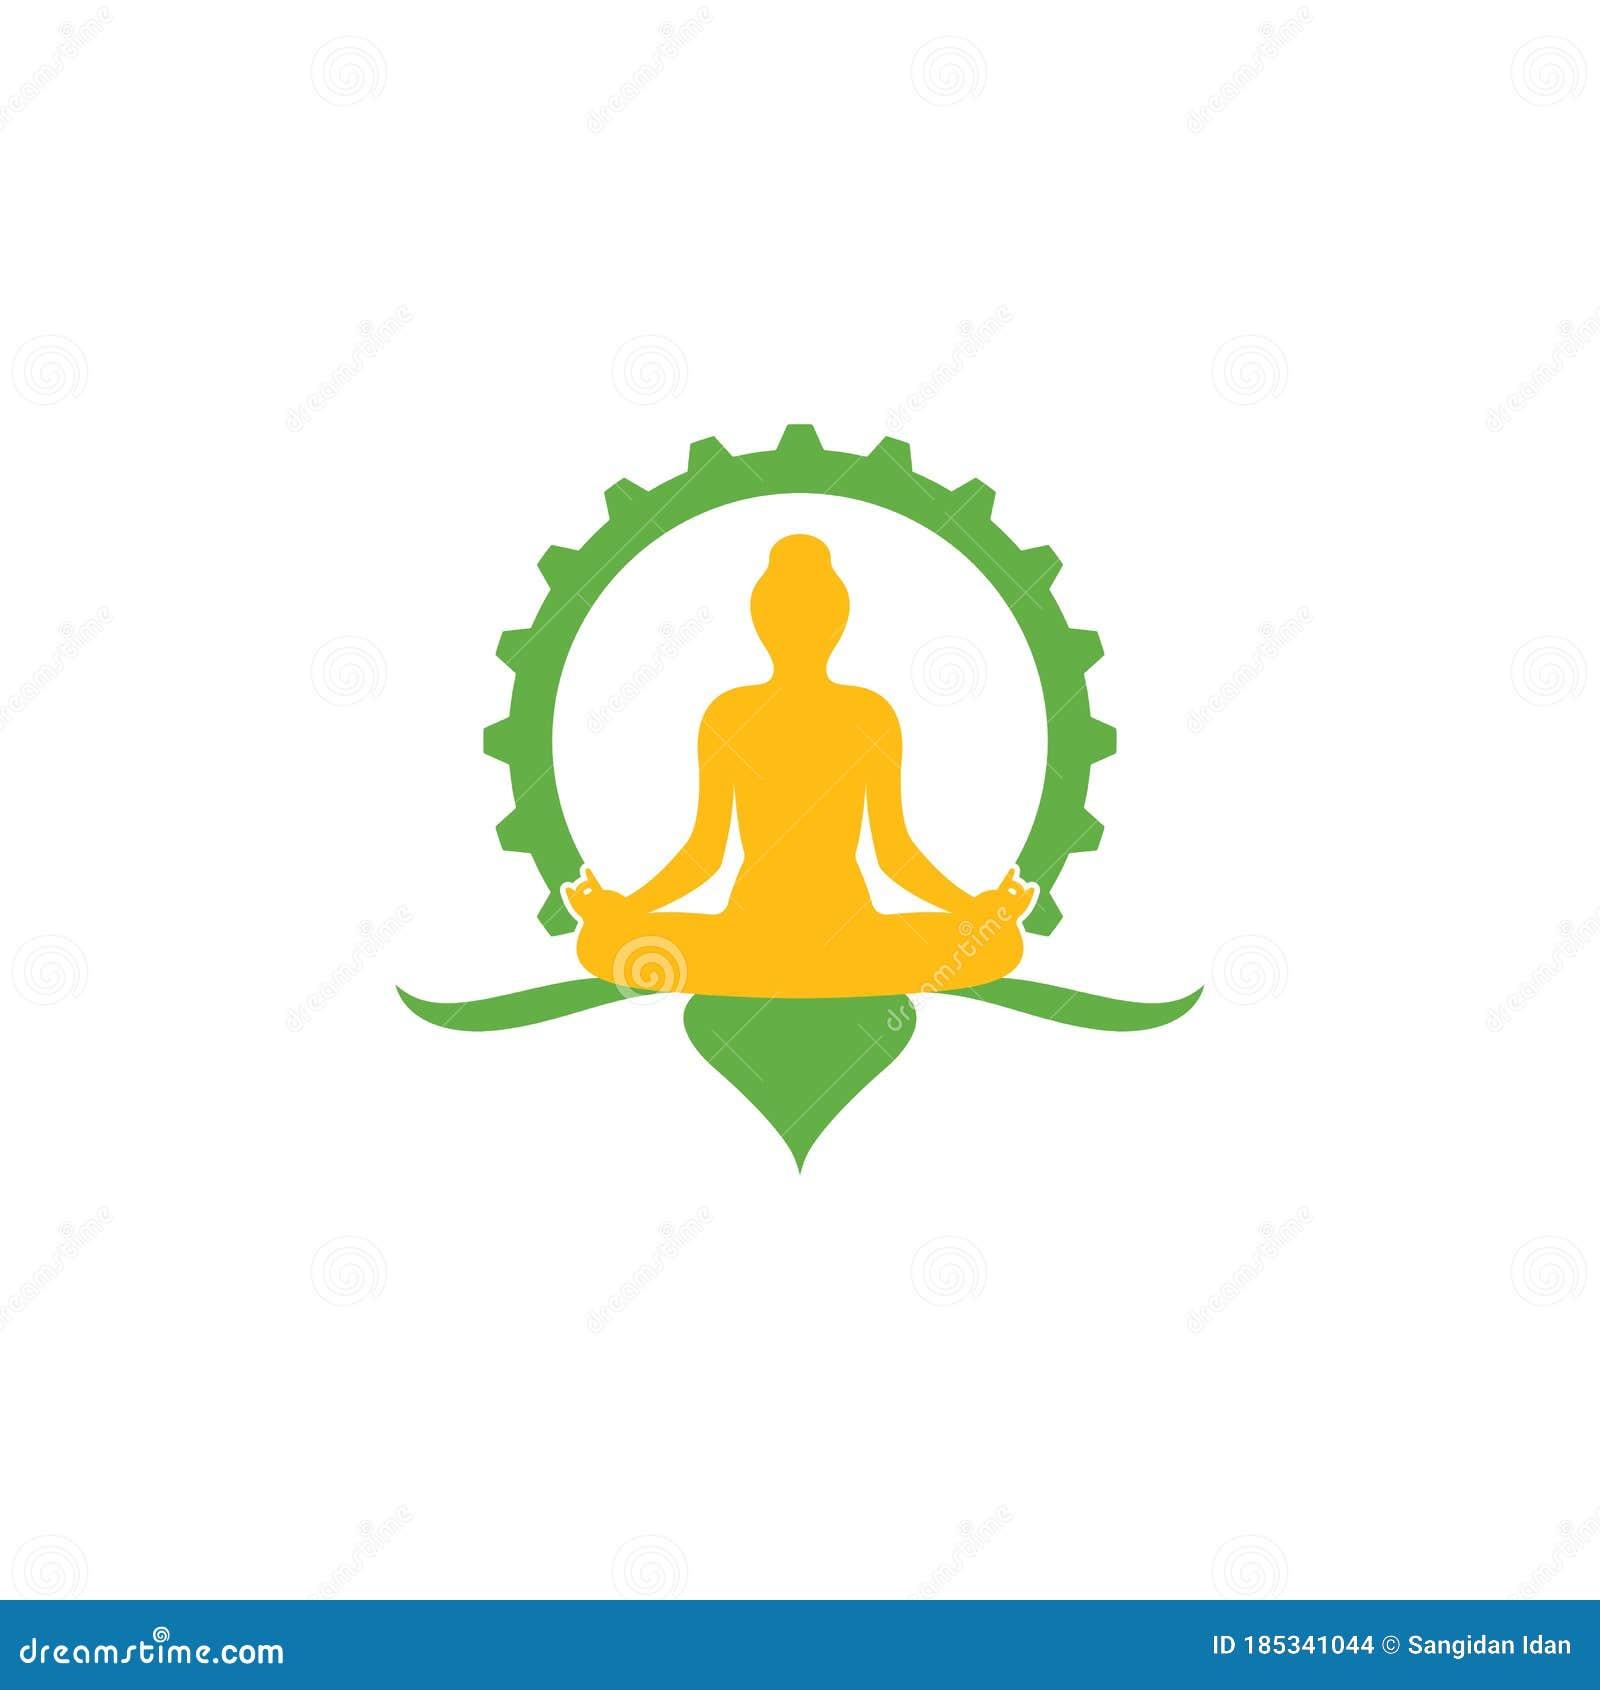 meditation logo template vector icon stock vector illustration of black relax 185341044 https www dreamstime com meditation logo template vector icon design meditation logo template vector icon image185341044